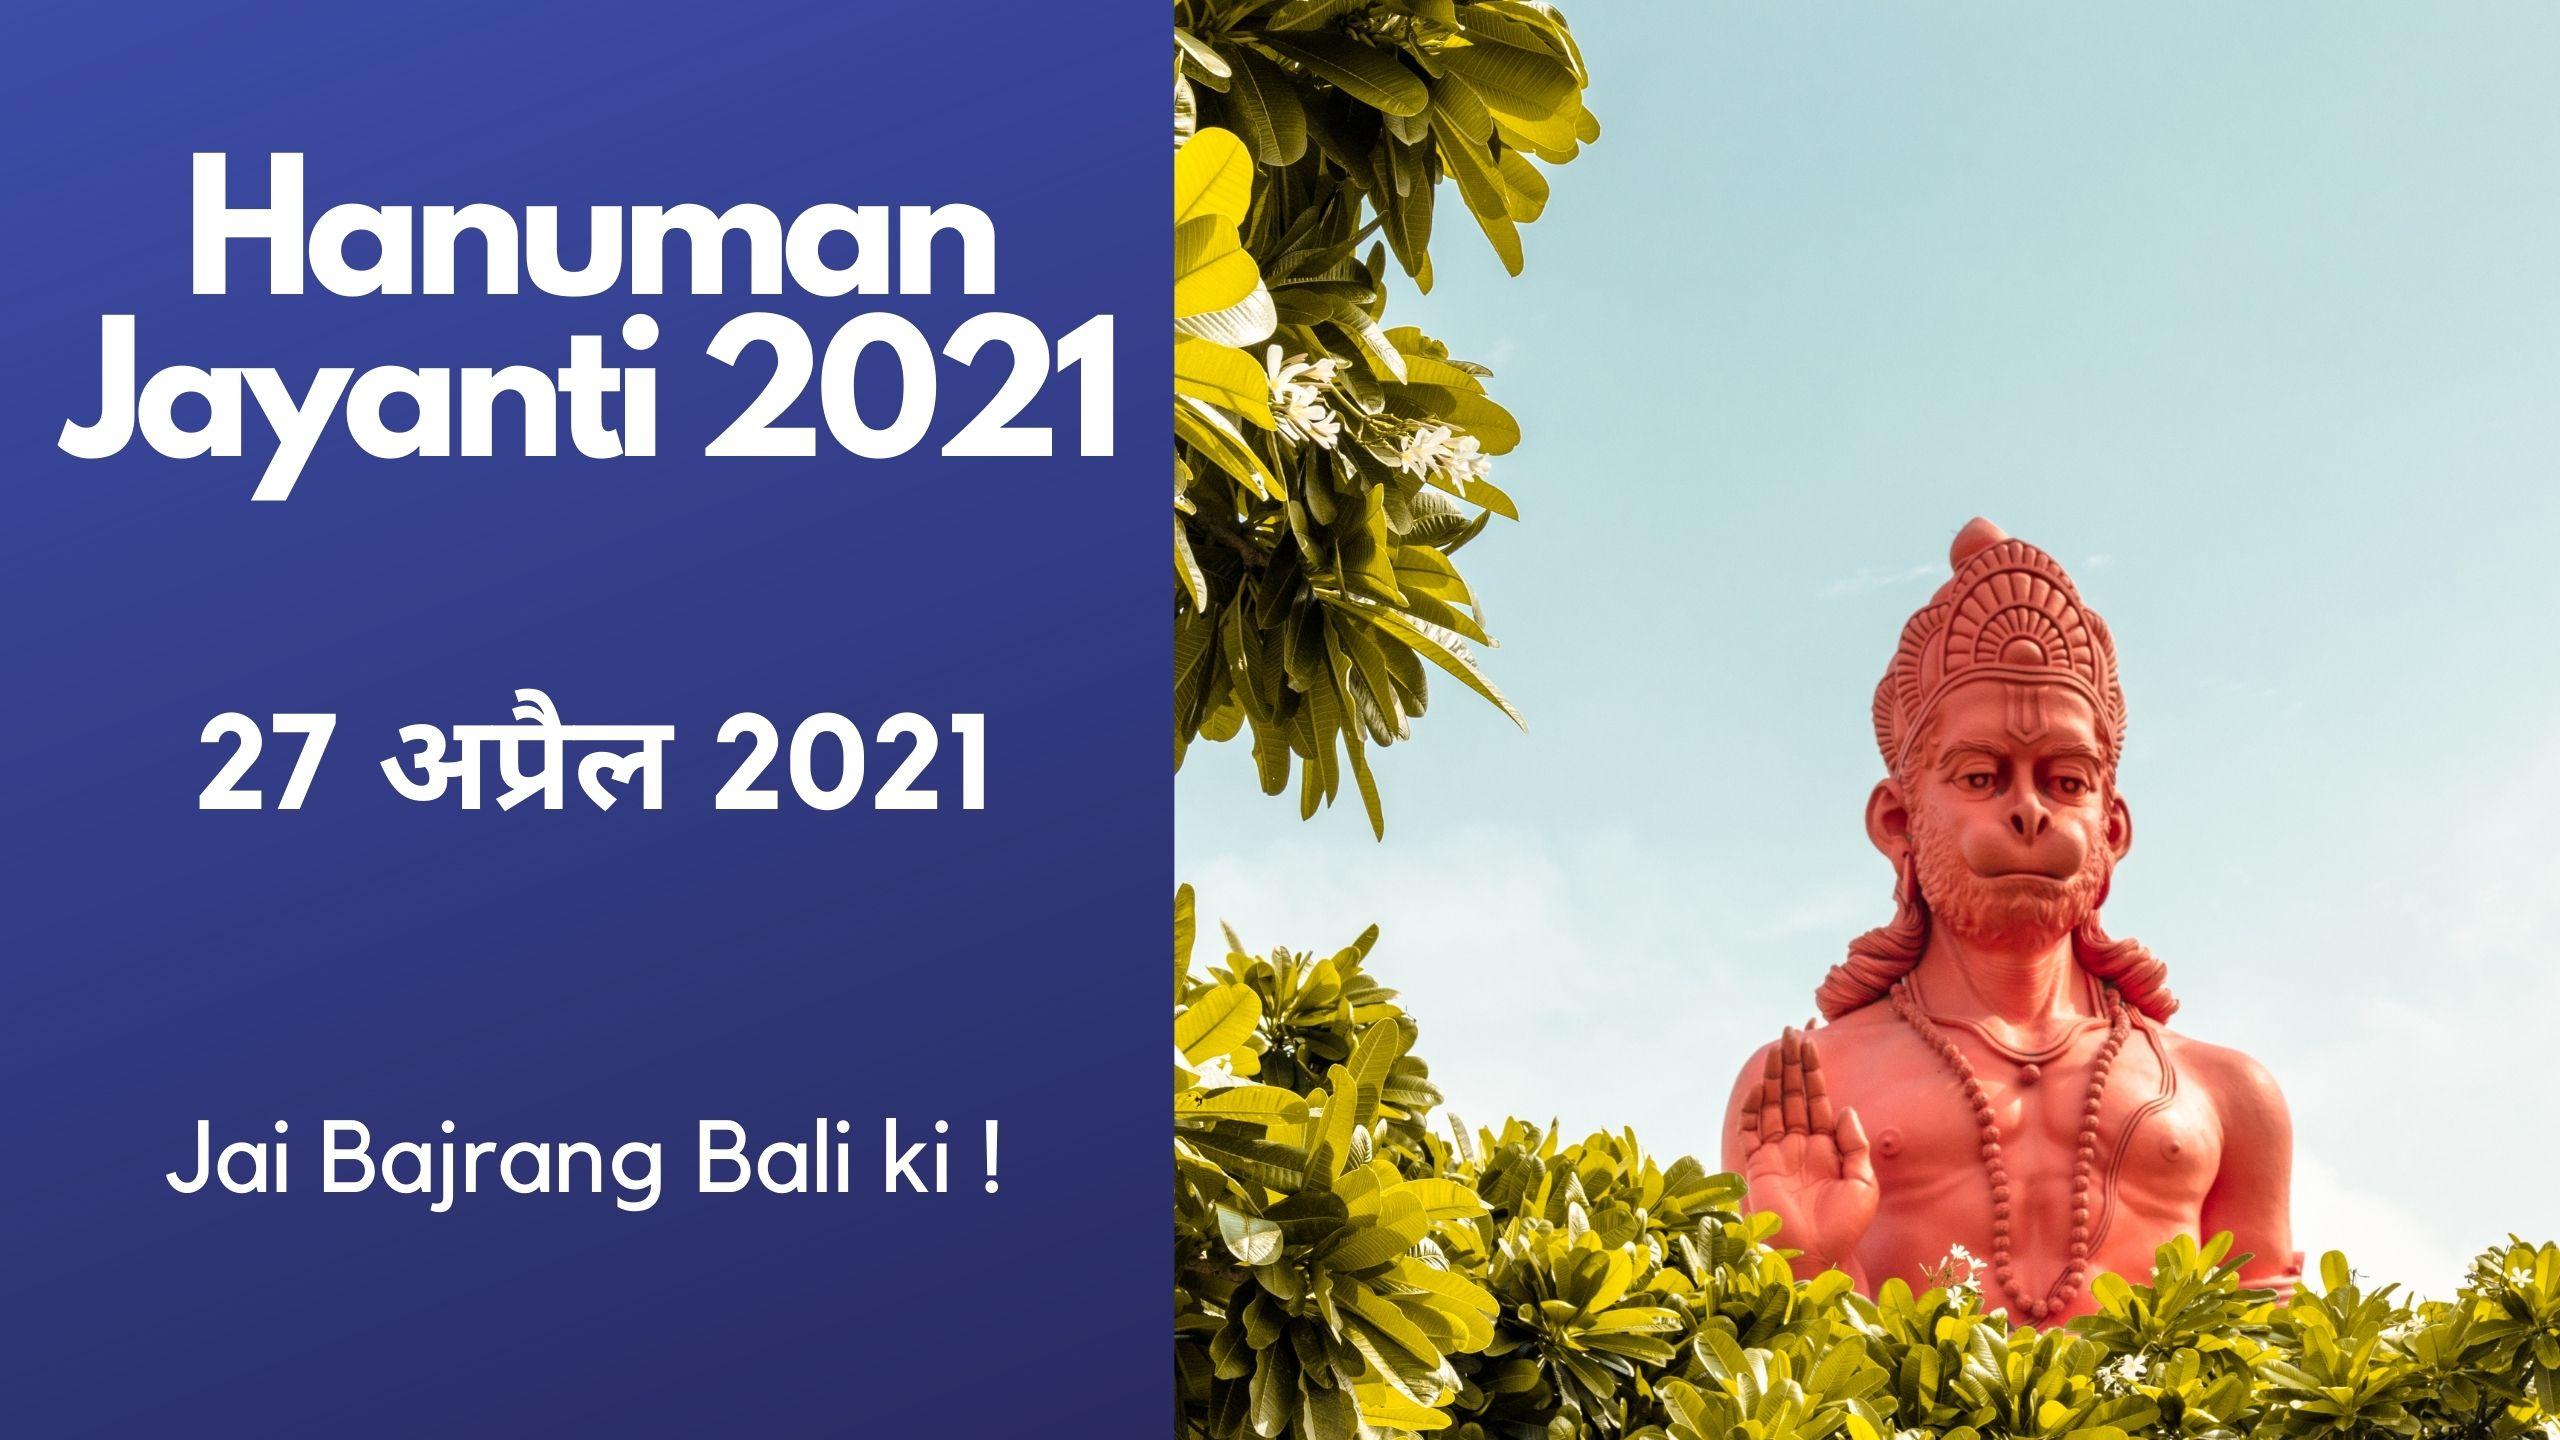 Hanuman Jayanti 2021